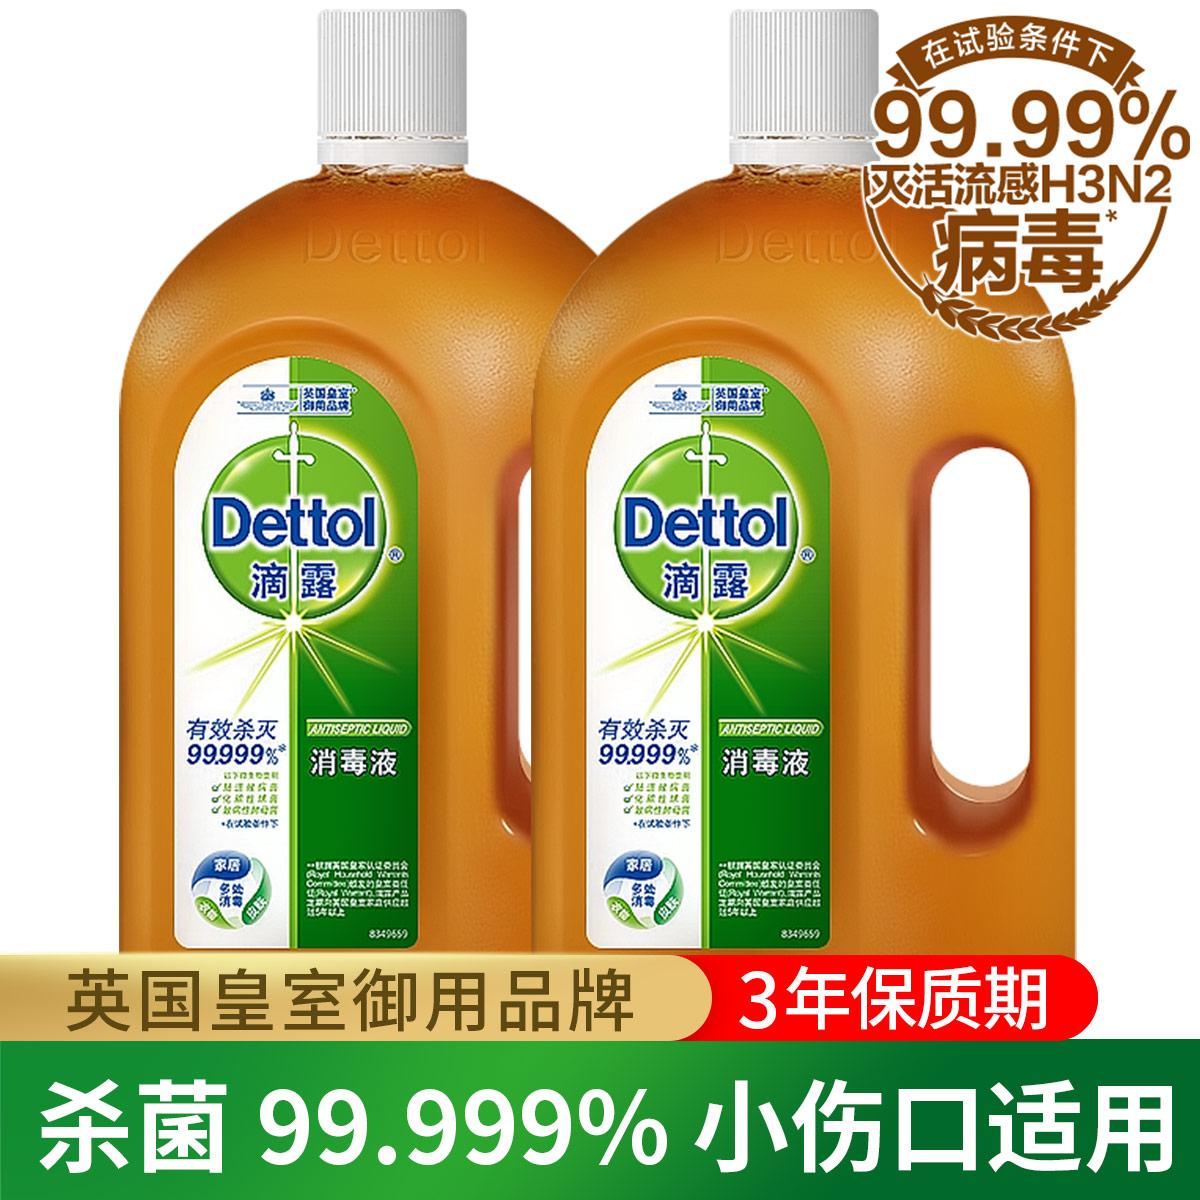 Dettol 【杀菌99.999%】滴露消毒液750ml*2多用途家用 伤口皮肤 衣物居家